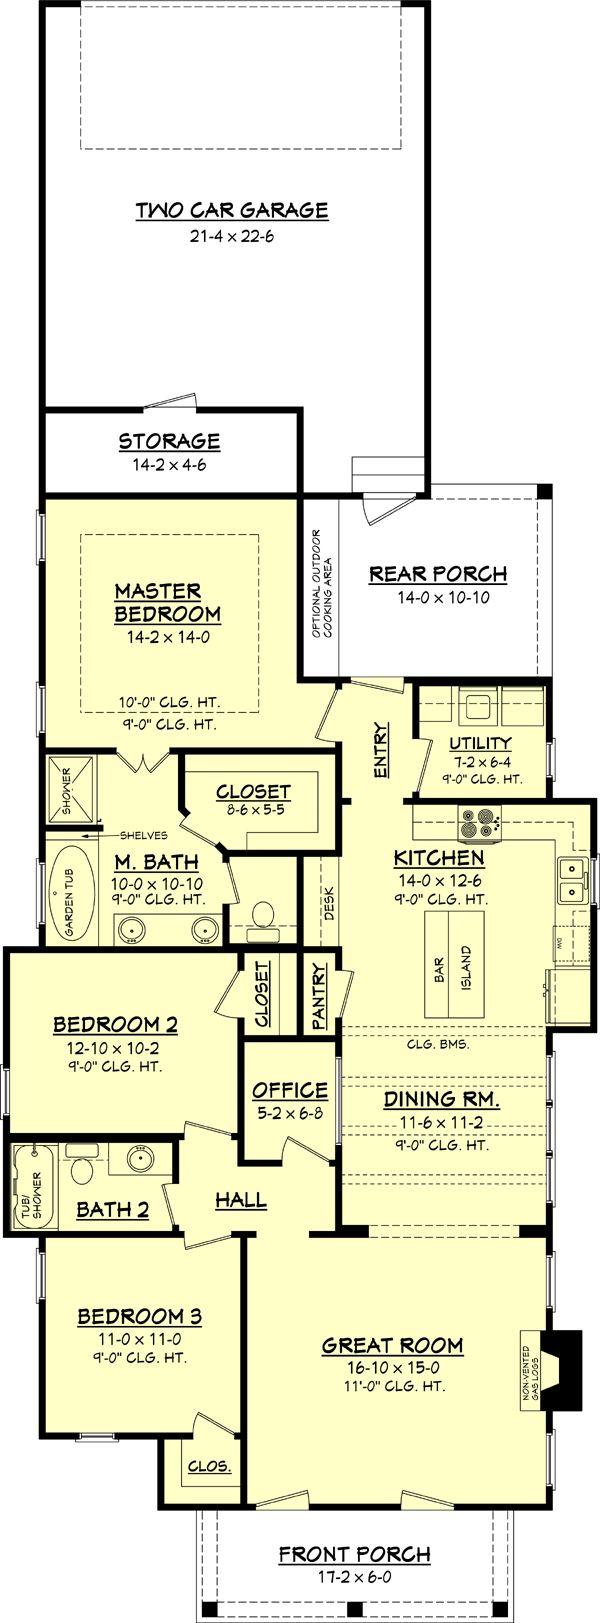 Cottage Style House Plan - 3 Beds 2 Baths 1550 Sq/Ft Plan #430-63 Floor Plan - Main Floor Plan - Houseplans.com